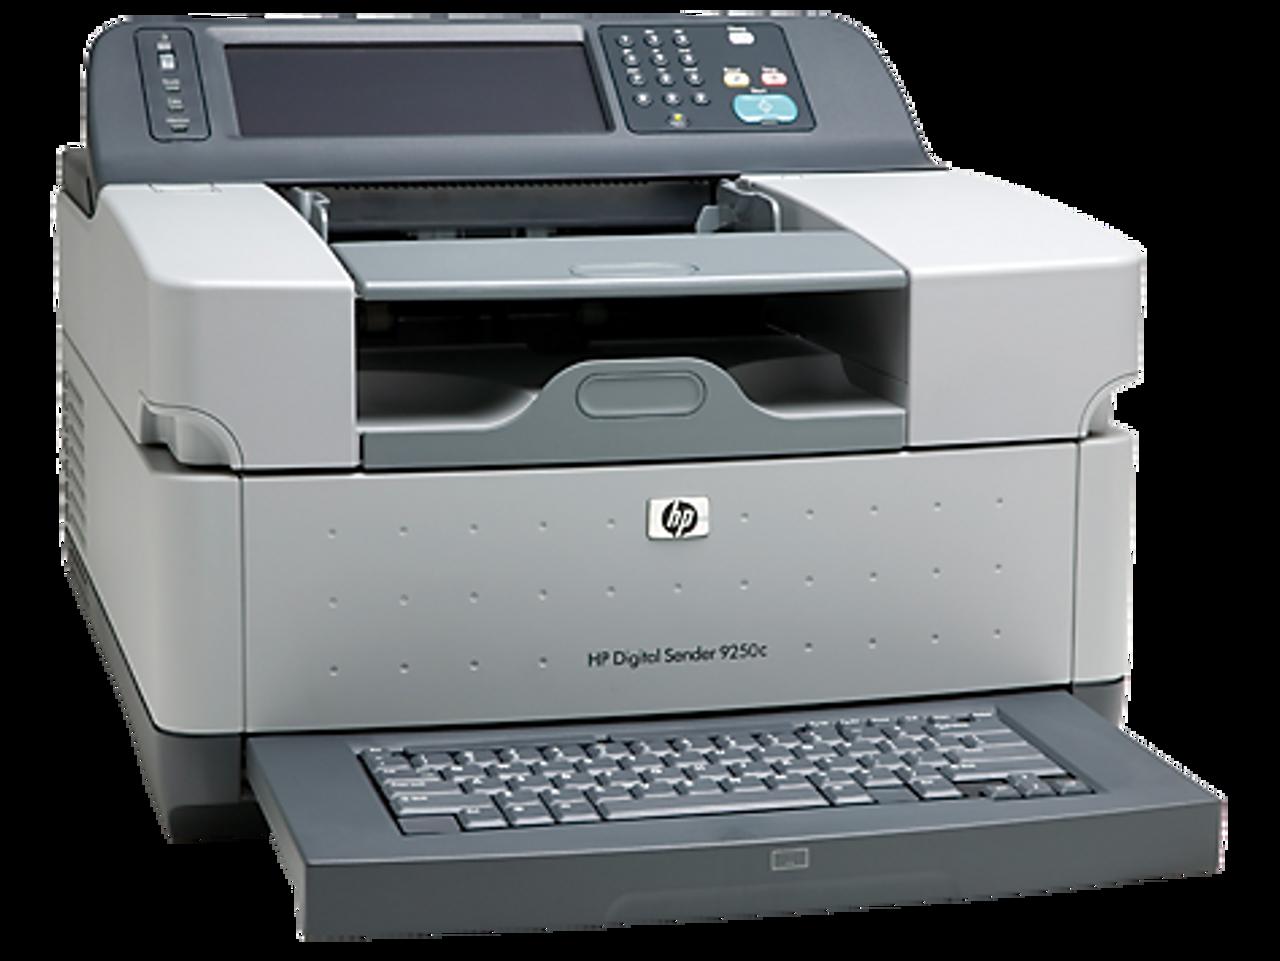 HP Digital Sender 9250c - 600 dpi x 600 dpi -Document scanner